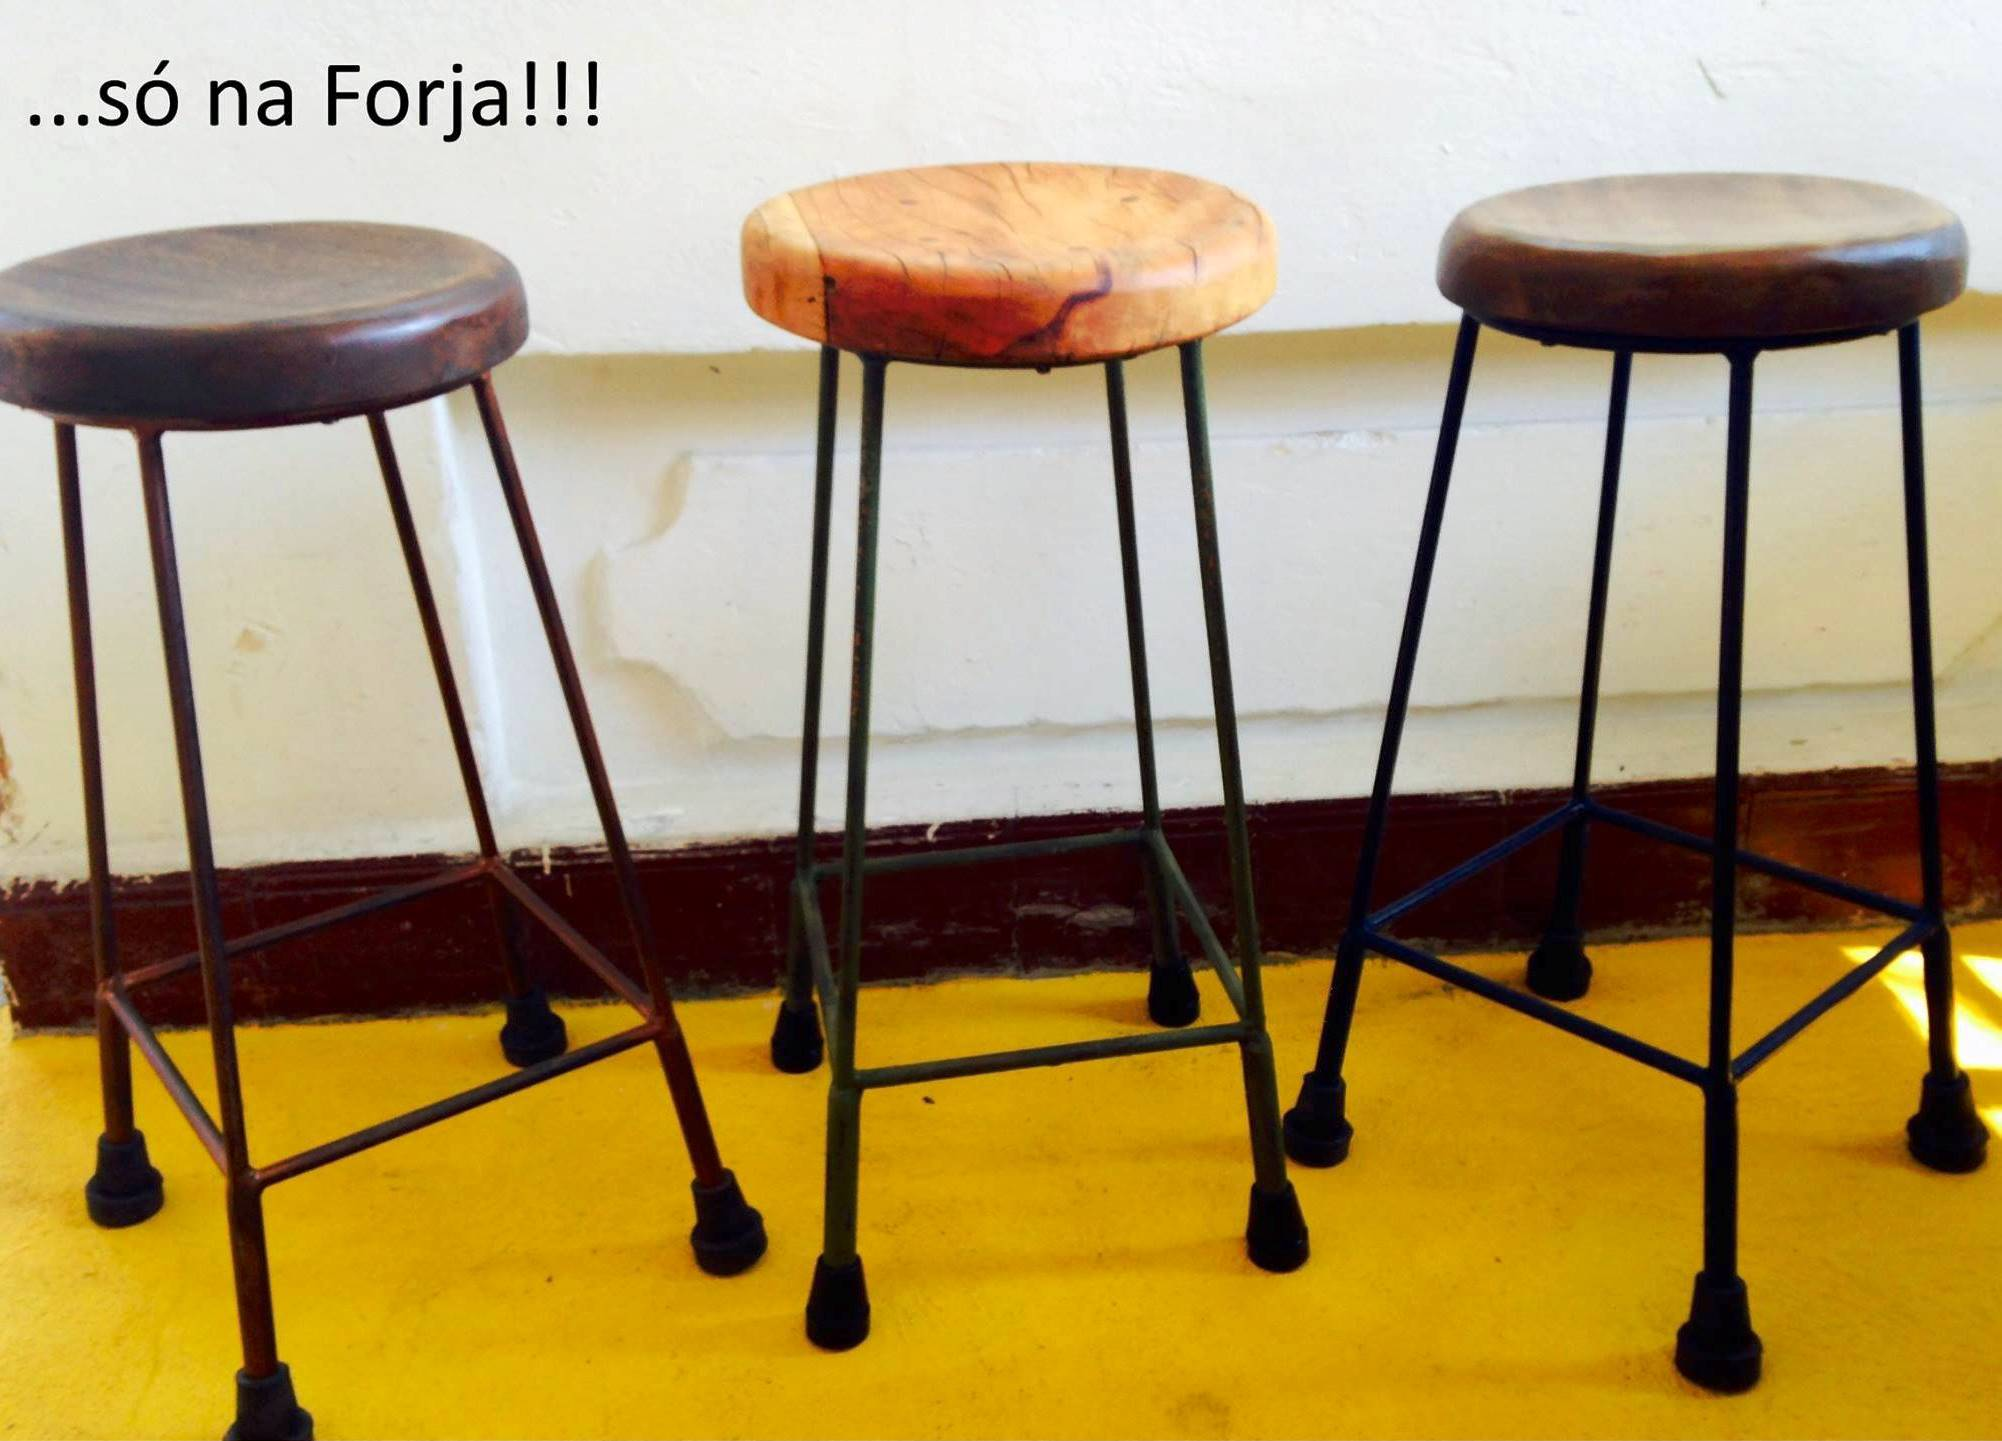 Banquinhos Forja